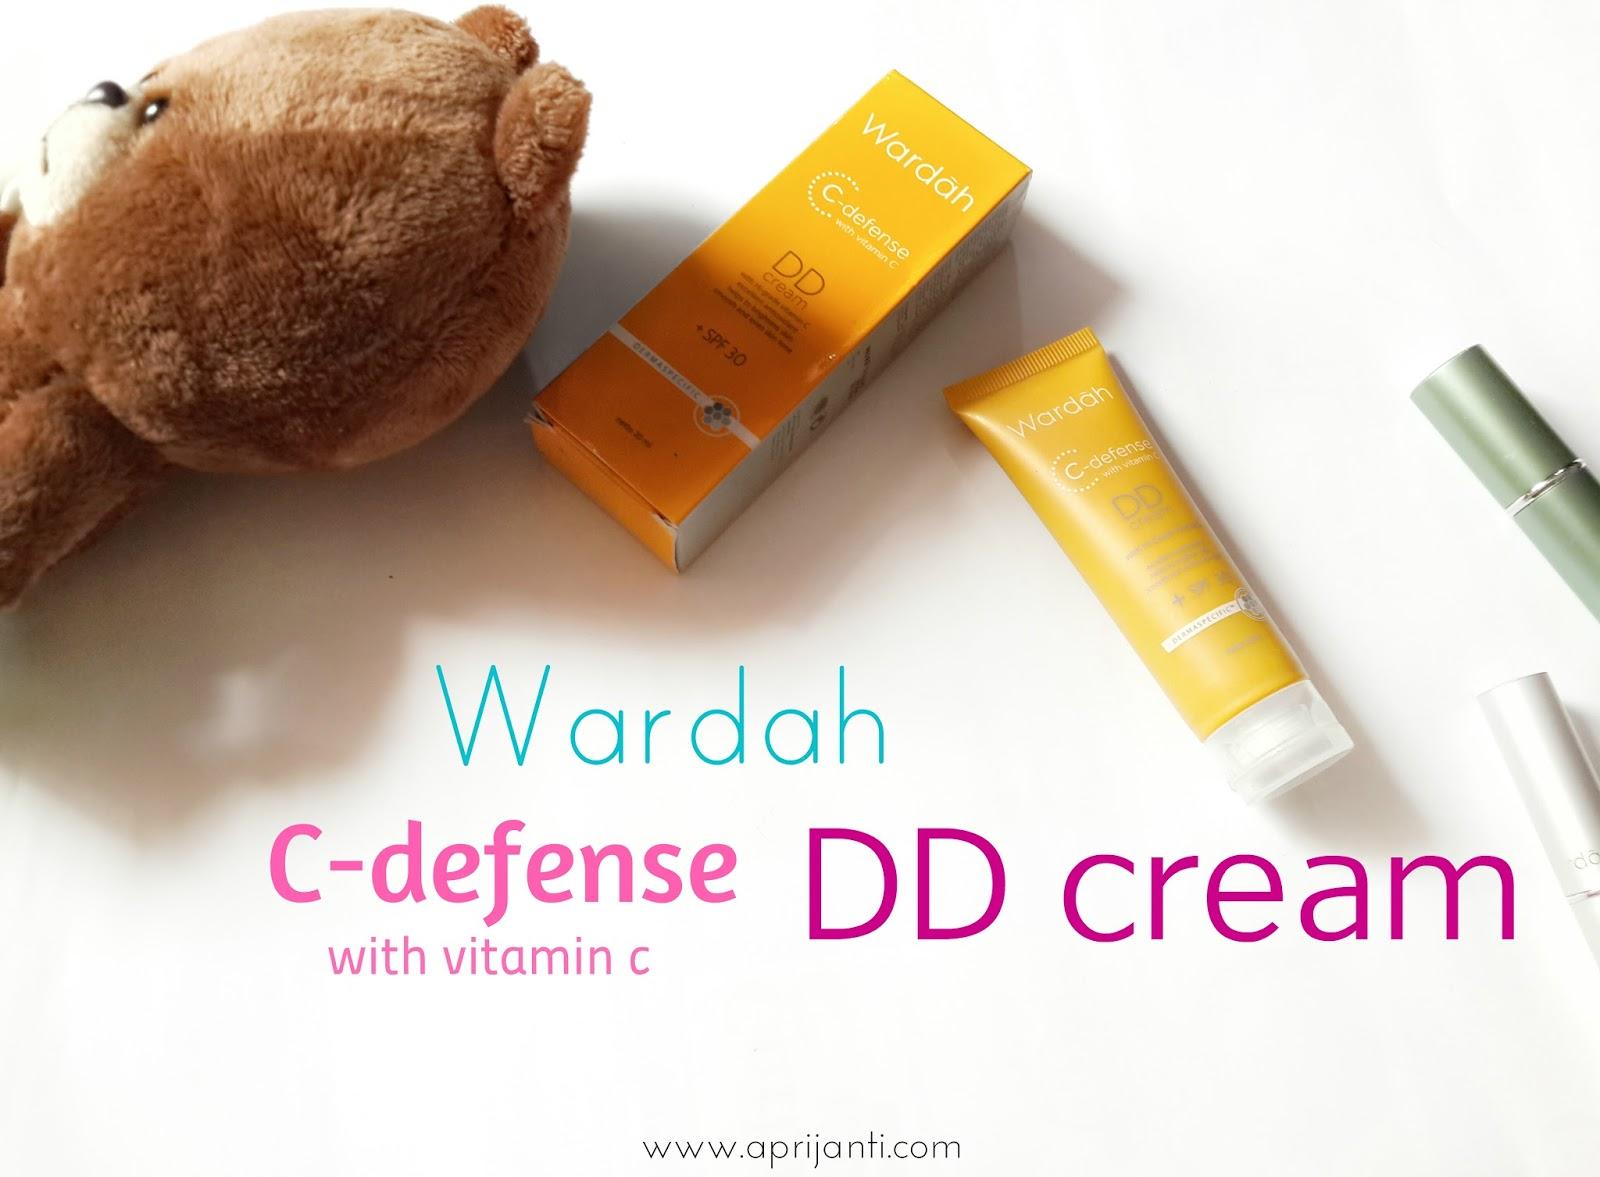 Review Wardah C-defence DD Cream (02 Natural) — APRIJANTI